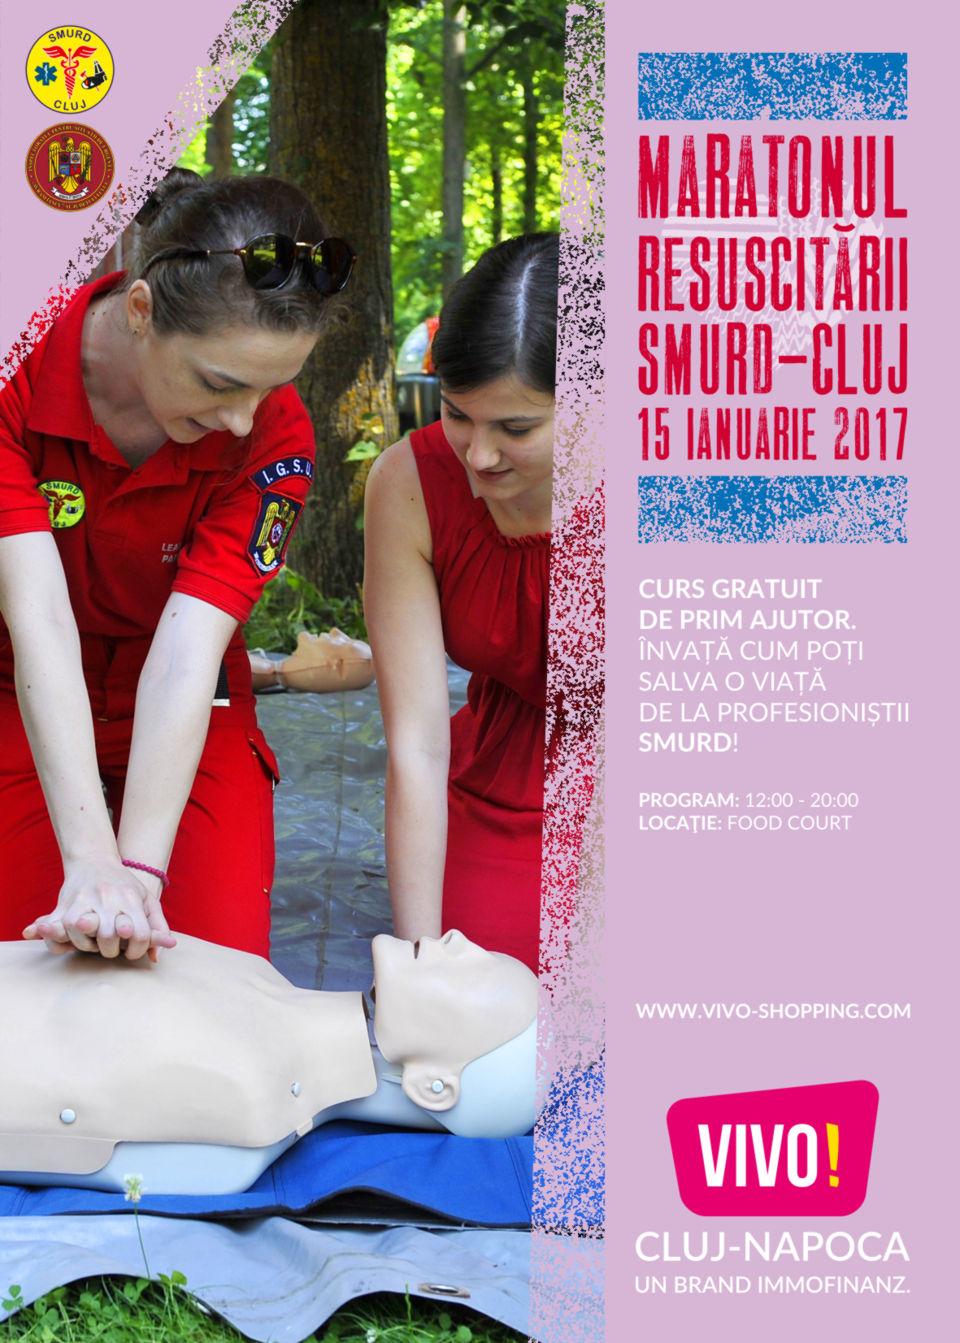 Maratonul Resuscitării – SMURD Cluj la VIVO! Cluj-Napoca